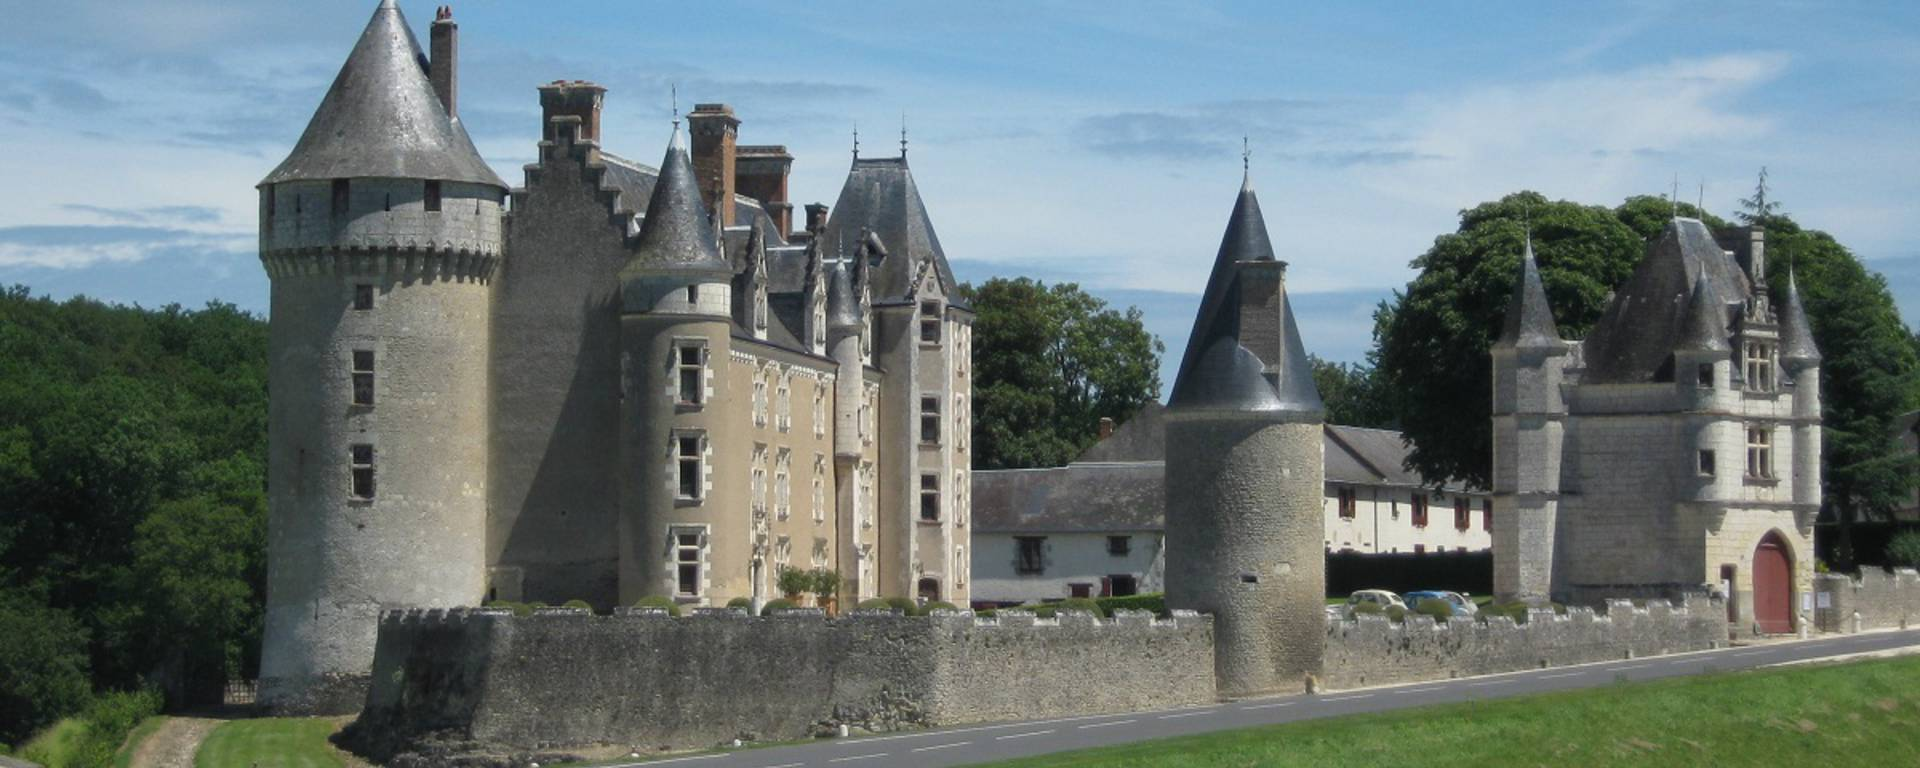 Schloss Montpoupon © OTBC